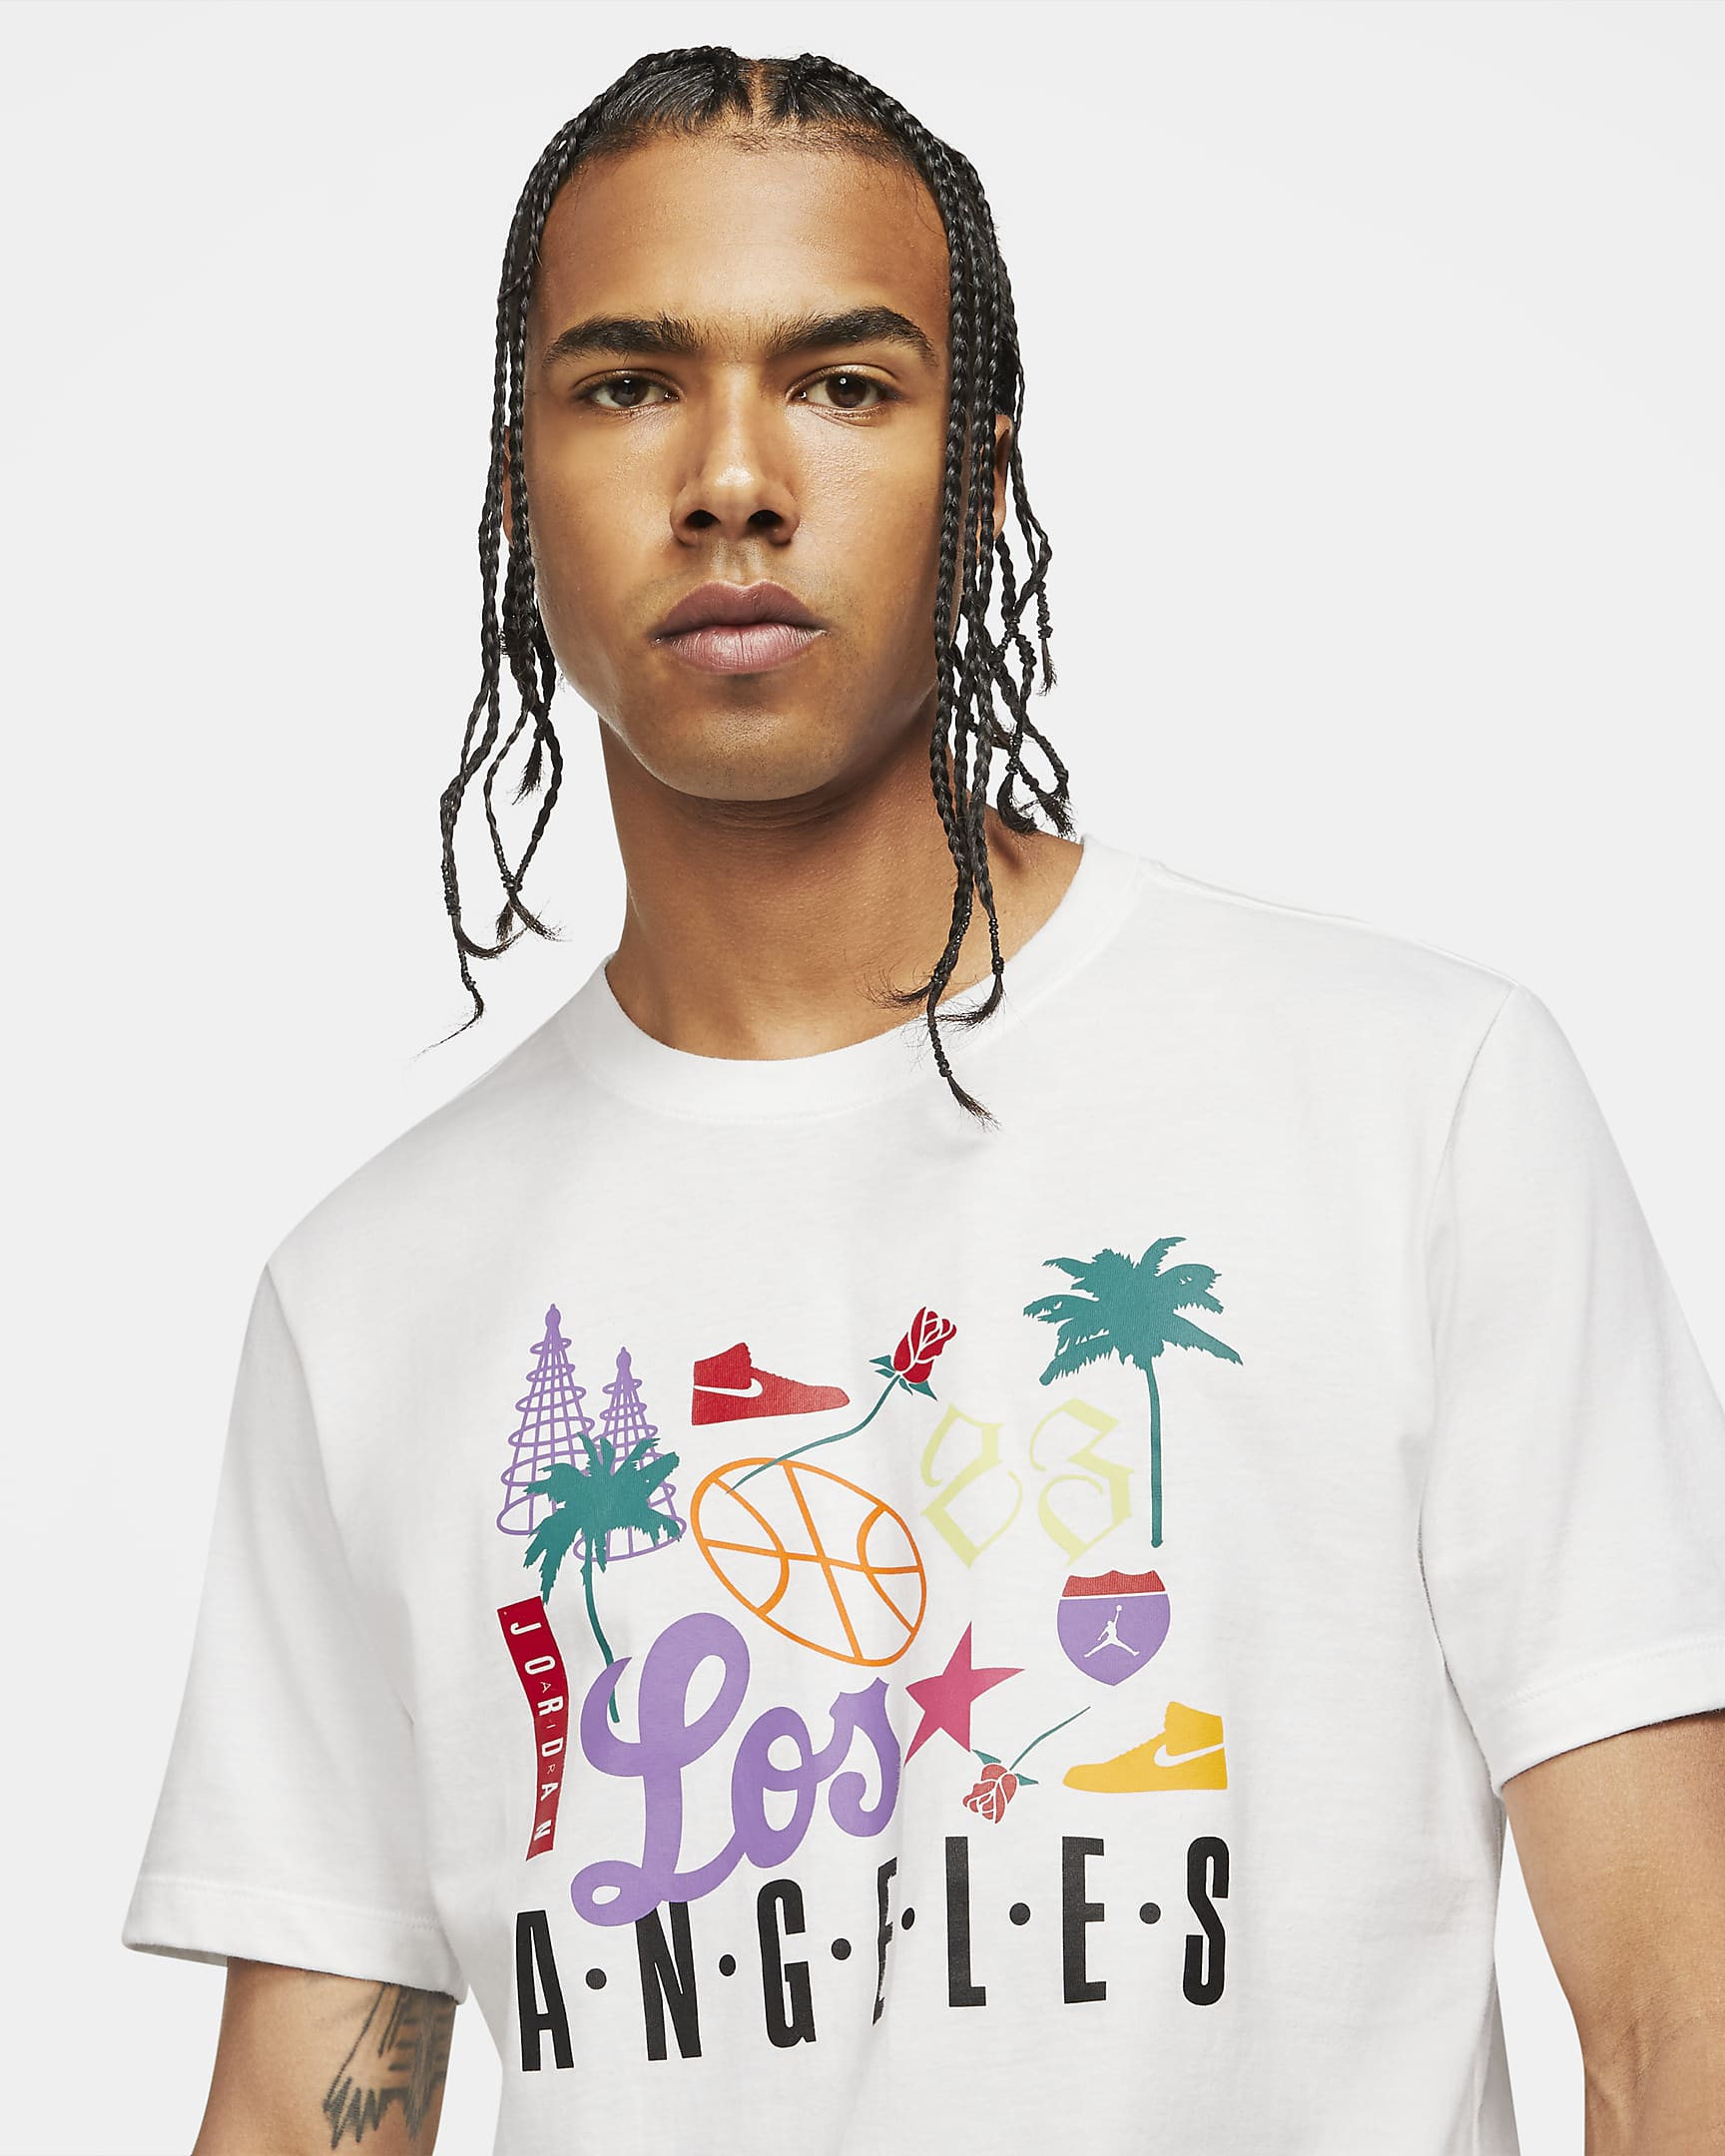 jordan-los-angeles-mens-short-sleeve-t-shirt-gvV55C-2